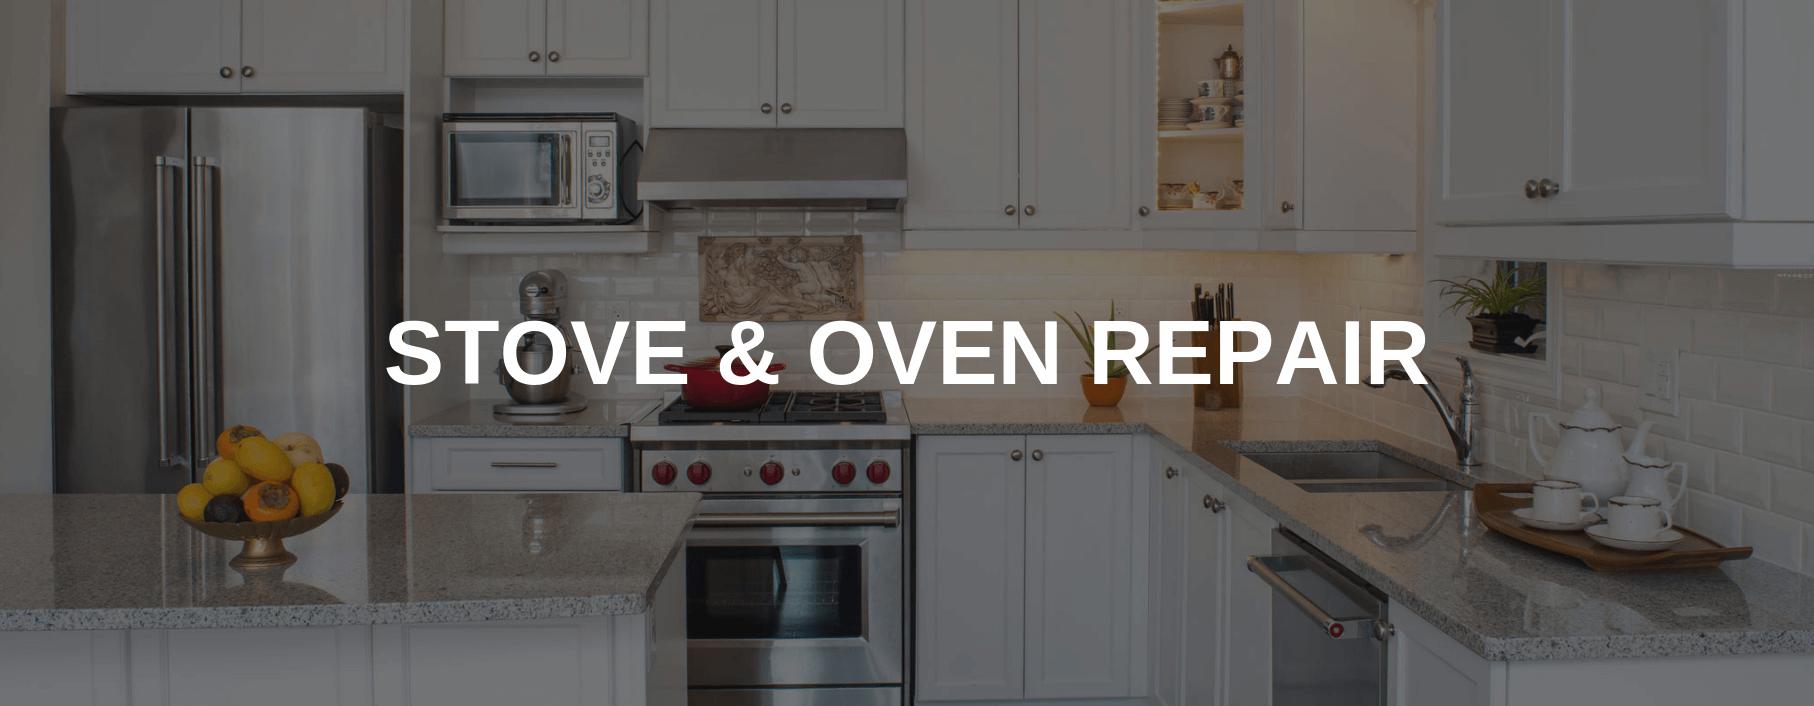 stove repair concord